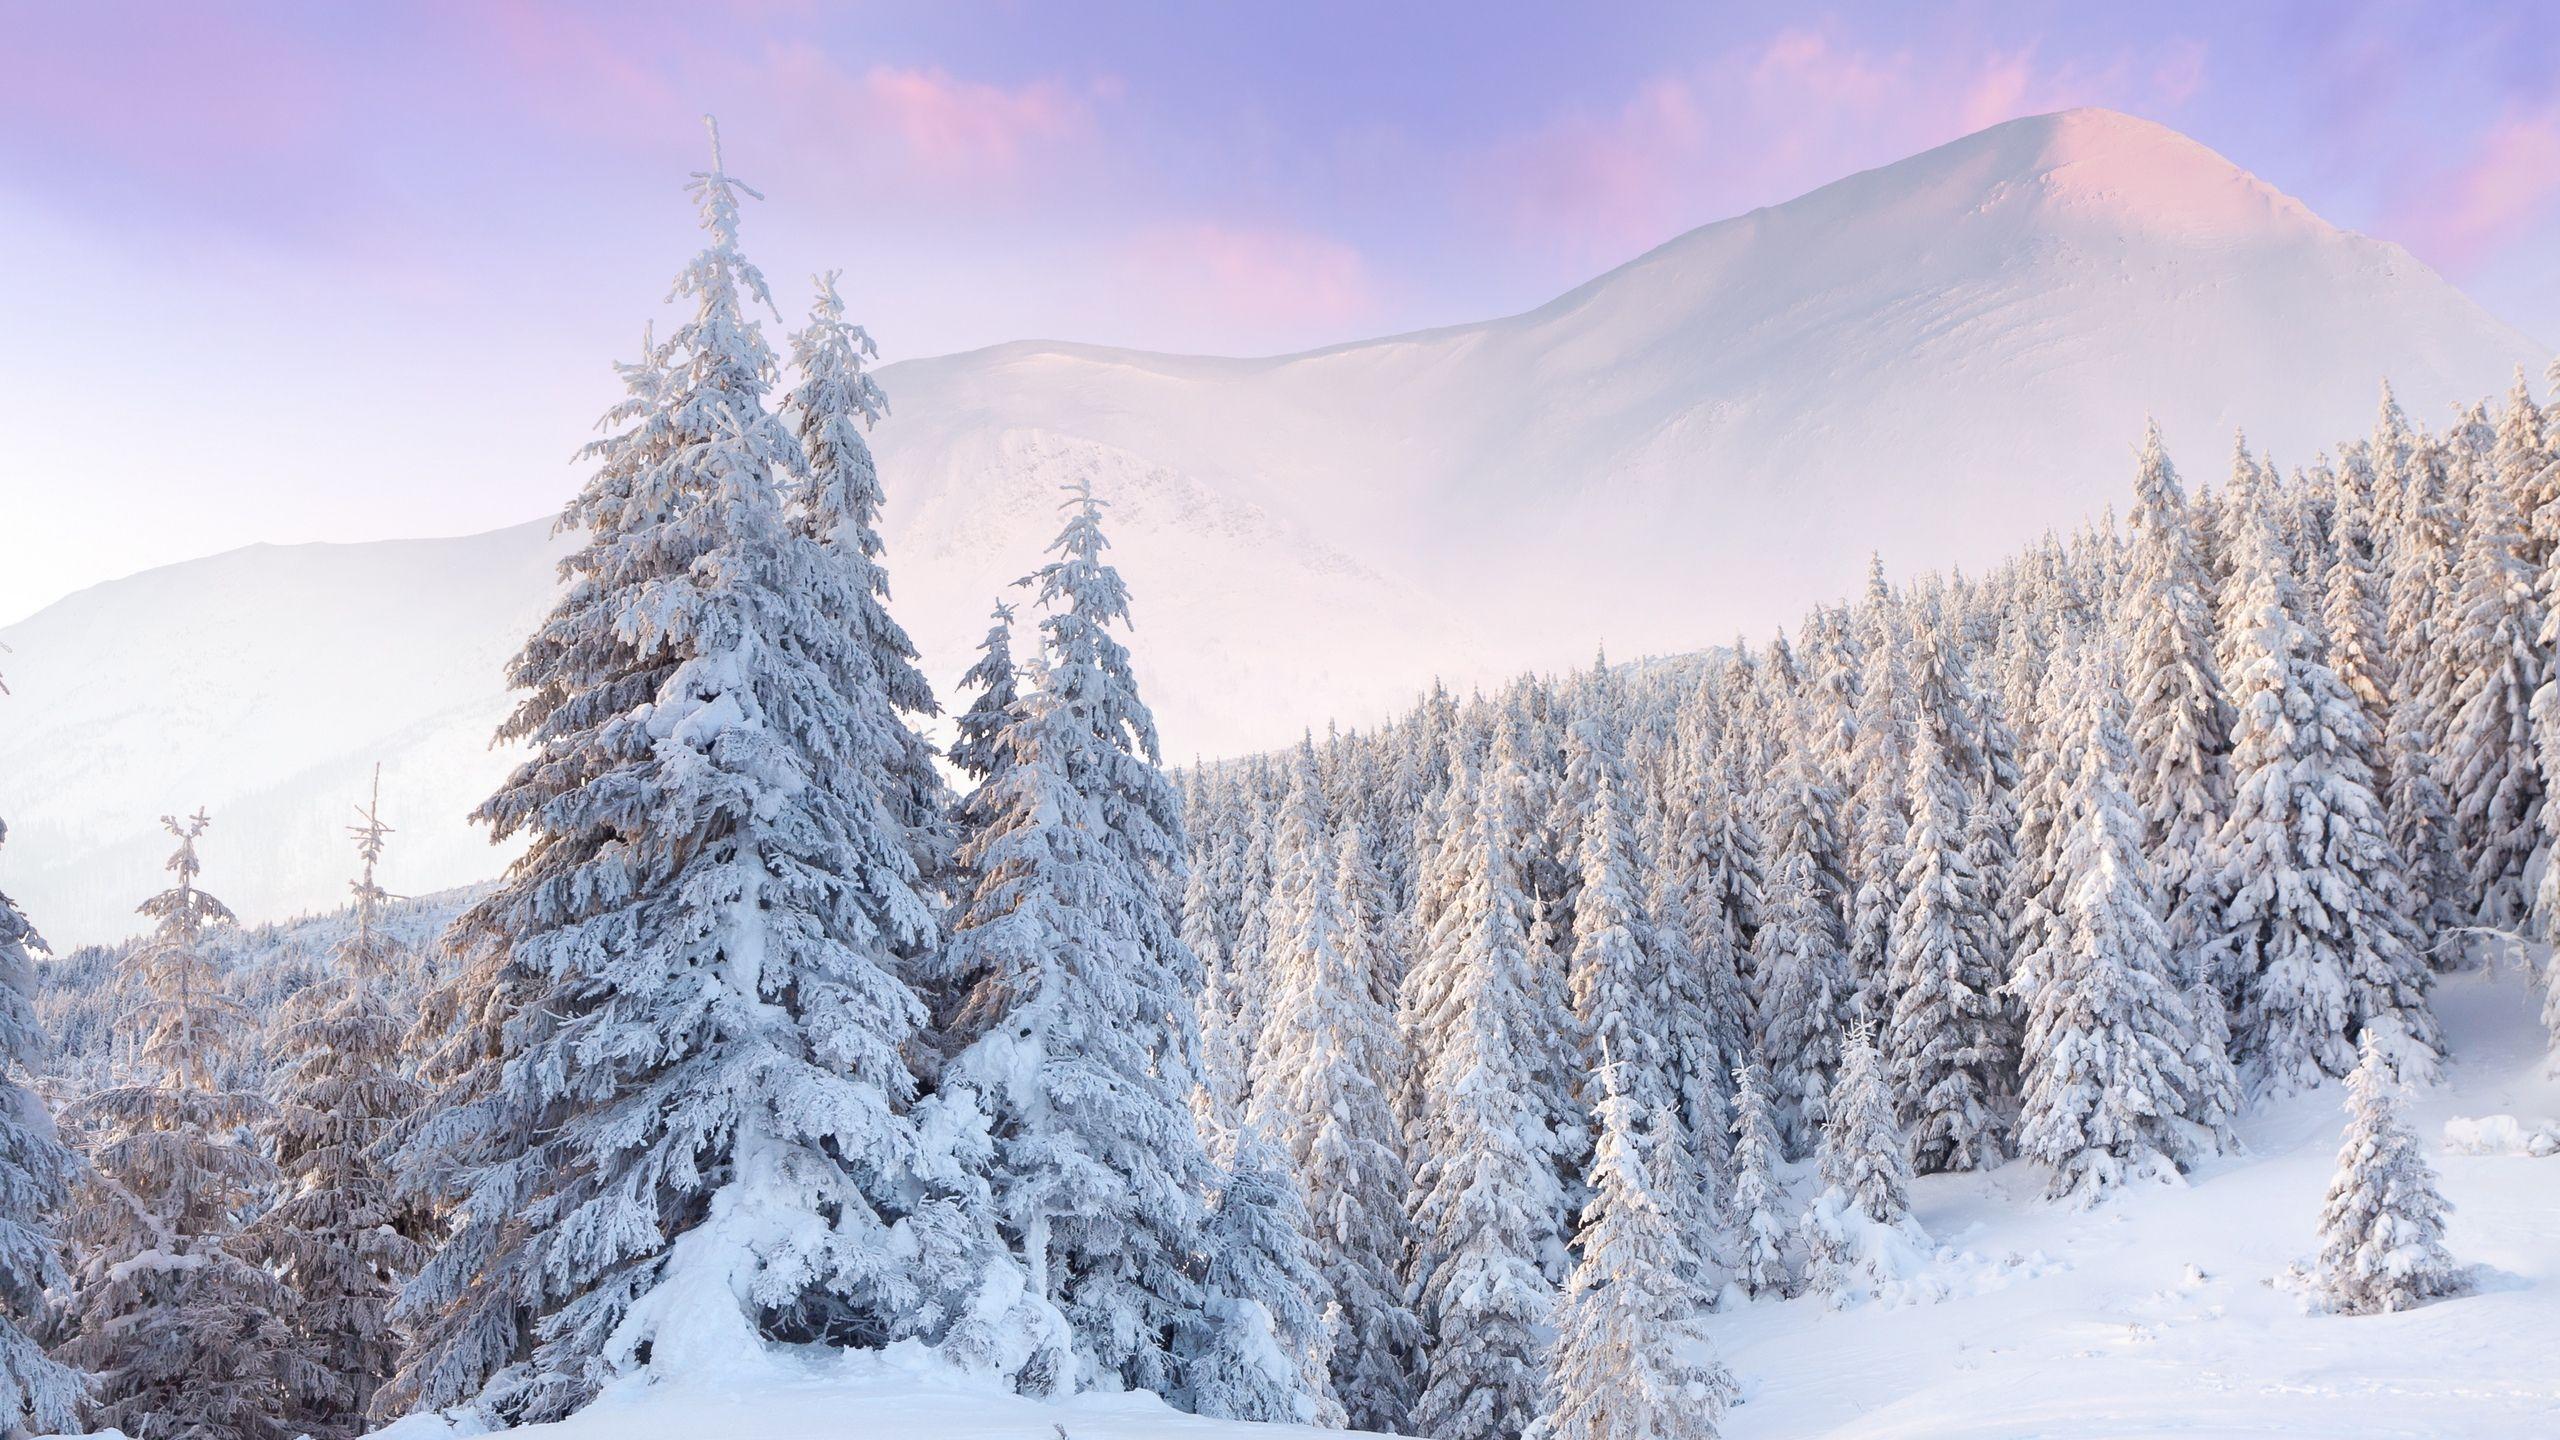 Scenic Winter Hd Wallpaper For Mac Amazing Wallpaperz Winter Wallpaper Background Snow